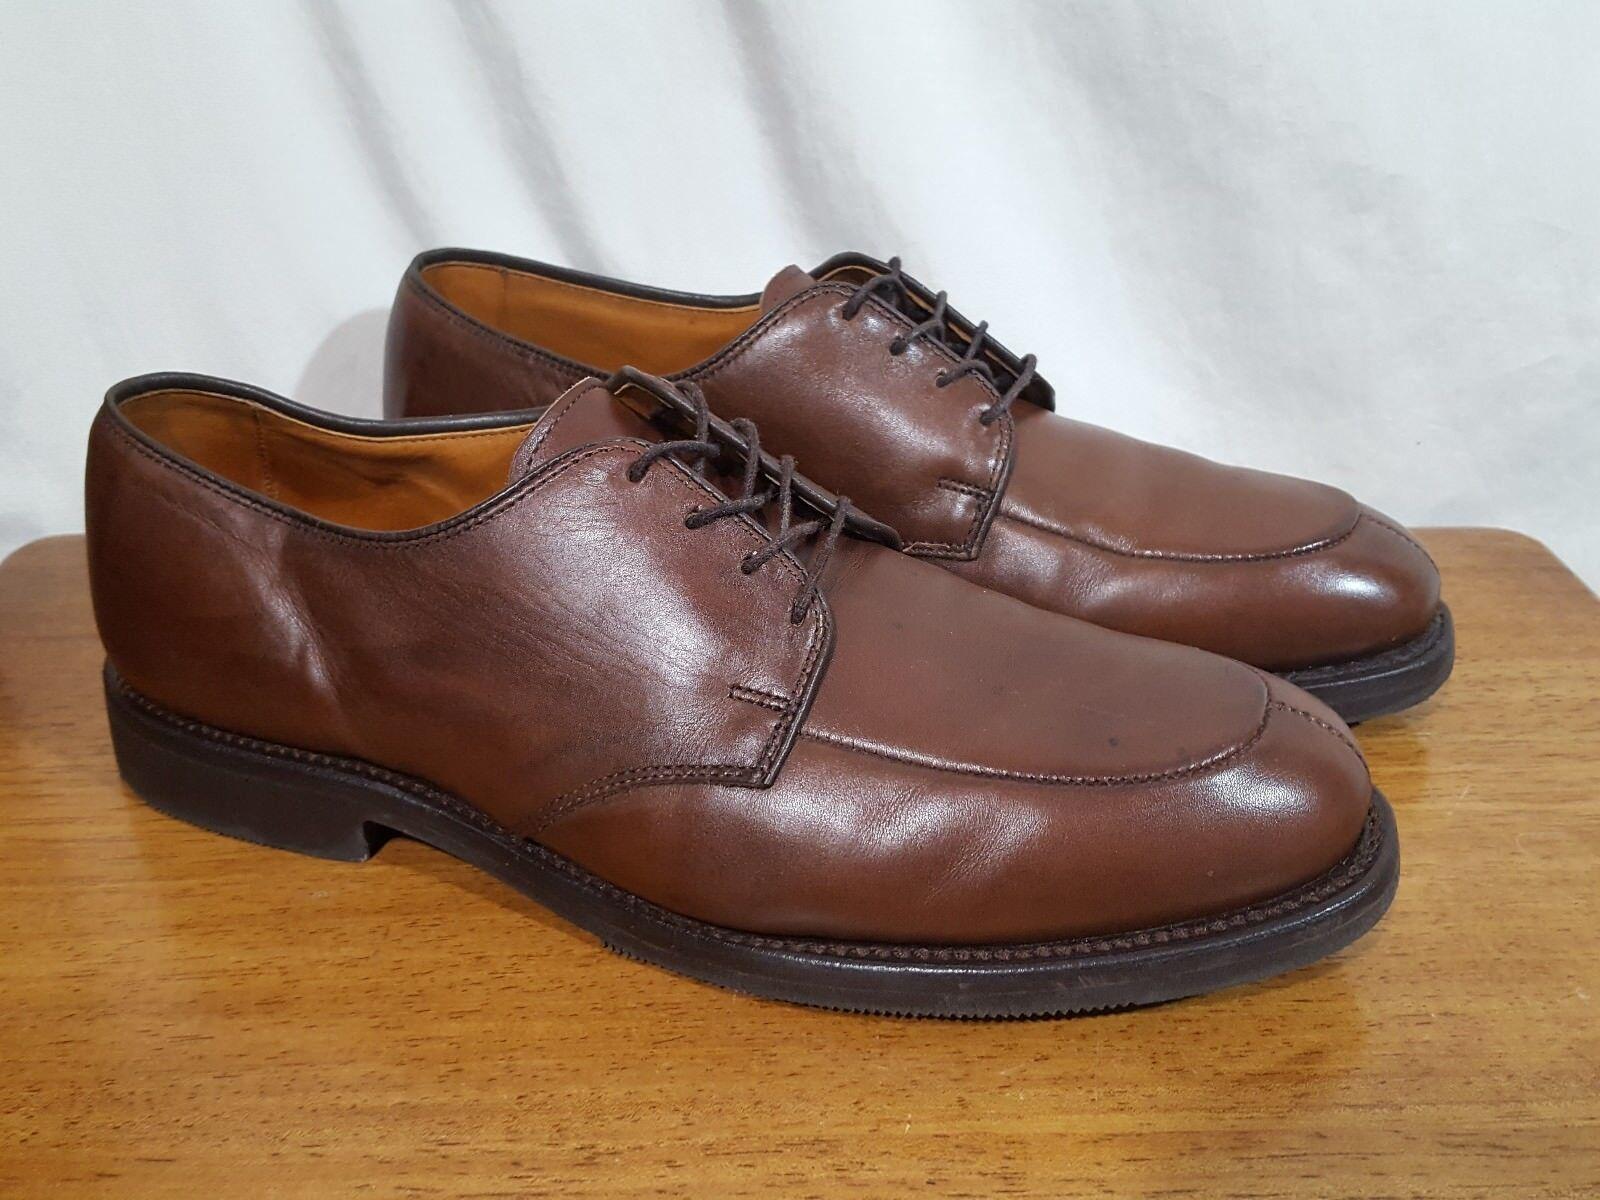 Men's Allen Edmonds Kennett Brown Leather Split Toe Oxford Dress shoes - 8.5 D